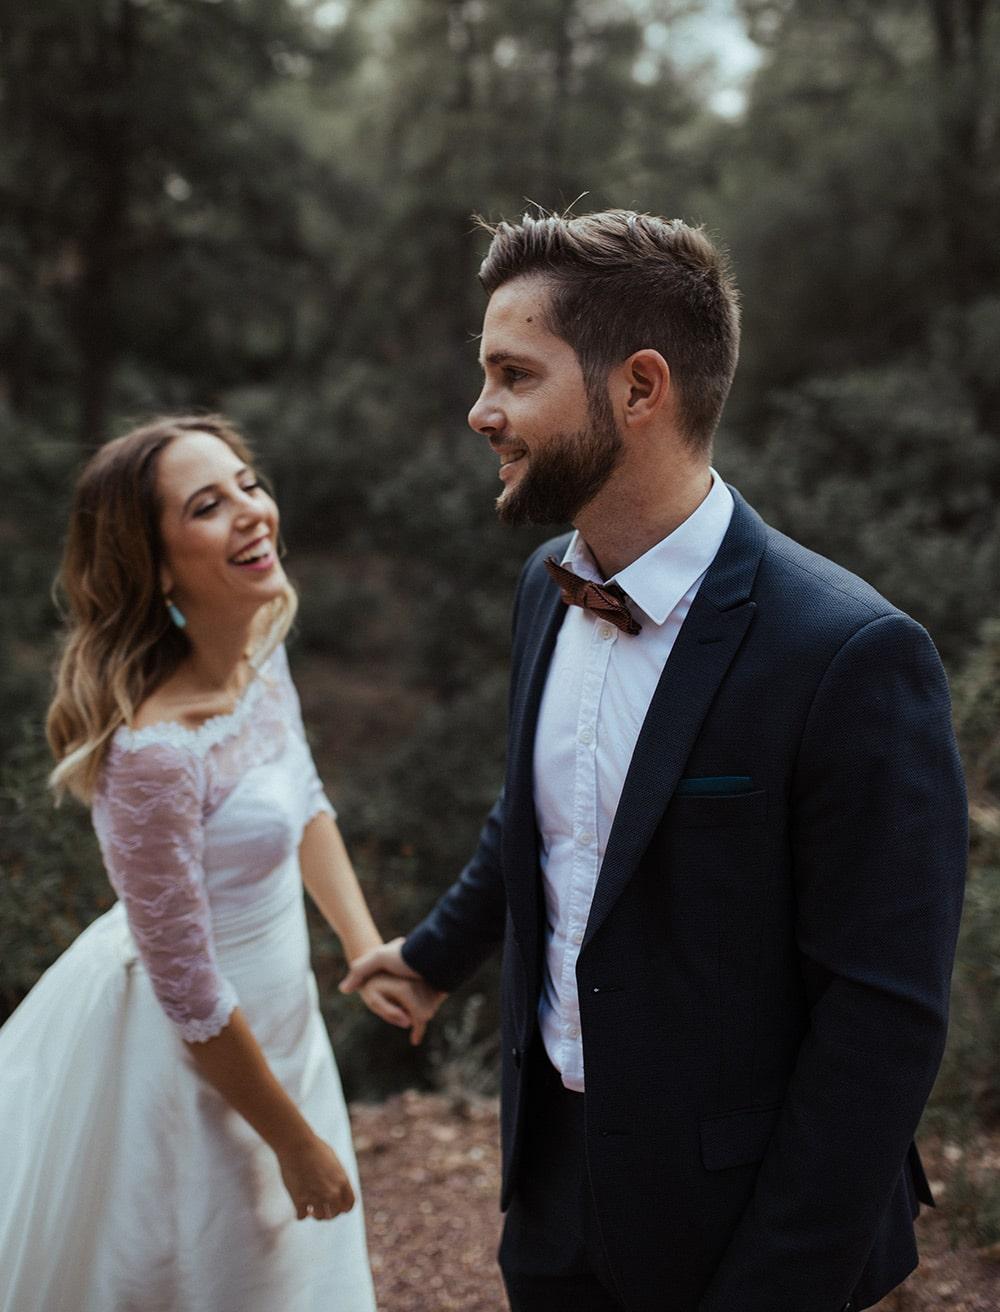 Fotografía pareja La Prometida